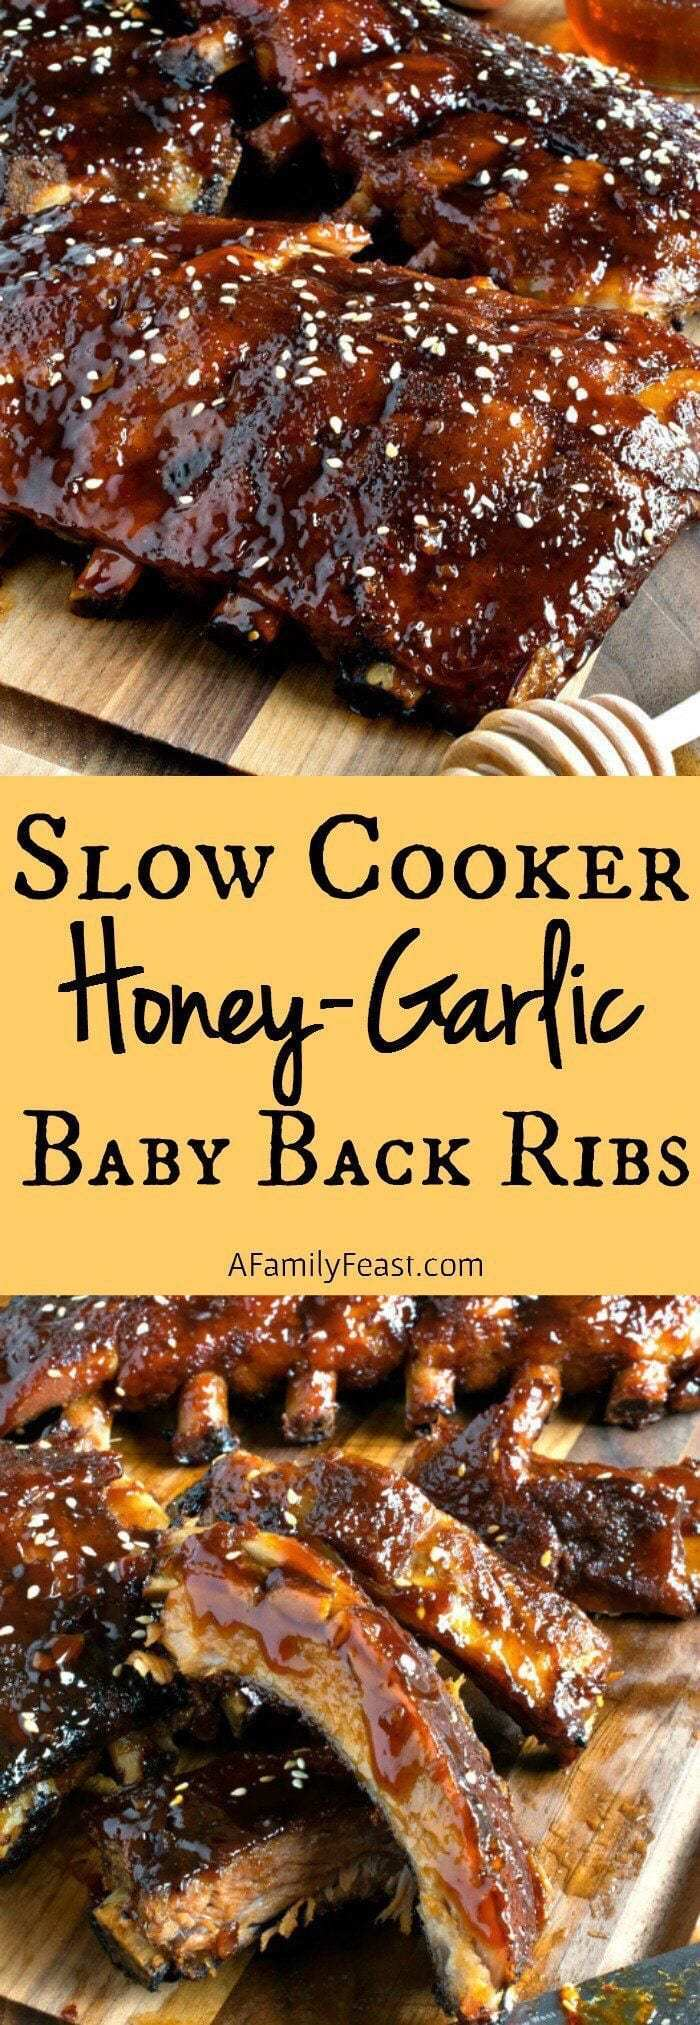 Slow-Cooker-Honey-Garlic-Baby-Back-Ribs